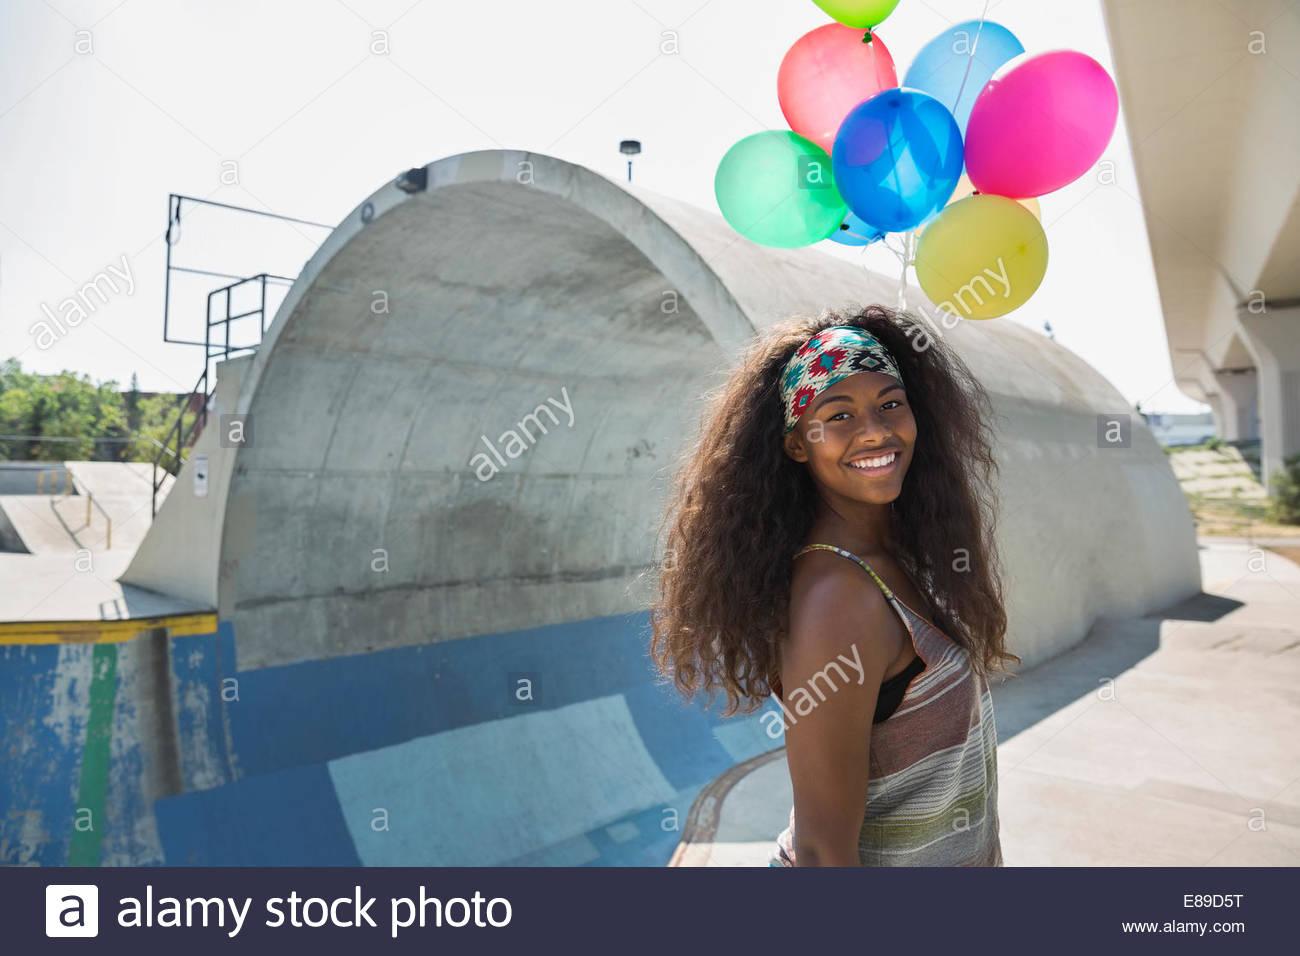 Adolescente con globos en skate park Imagen De Stock